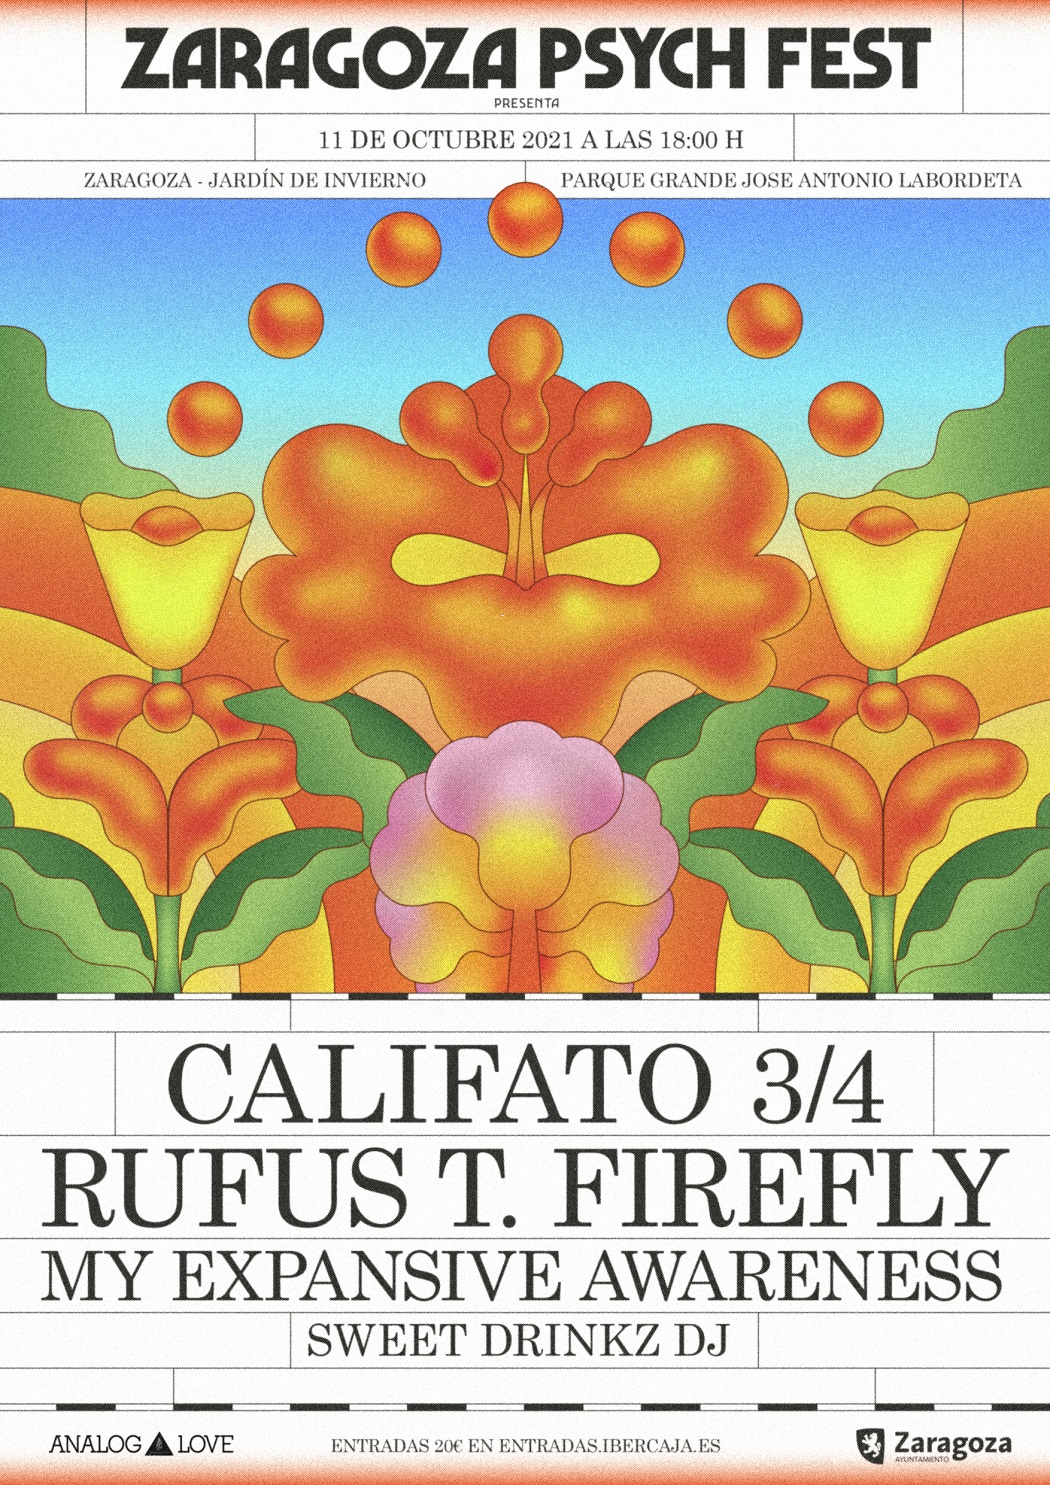 Califato 3/4, Rufus T. Firefly, My Expansive Awareness y Sweet Drinkz dj encabezan el Zaragoza Psych Fest